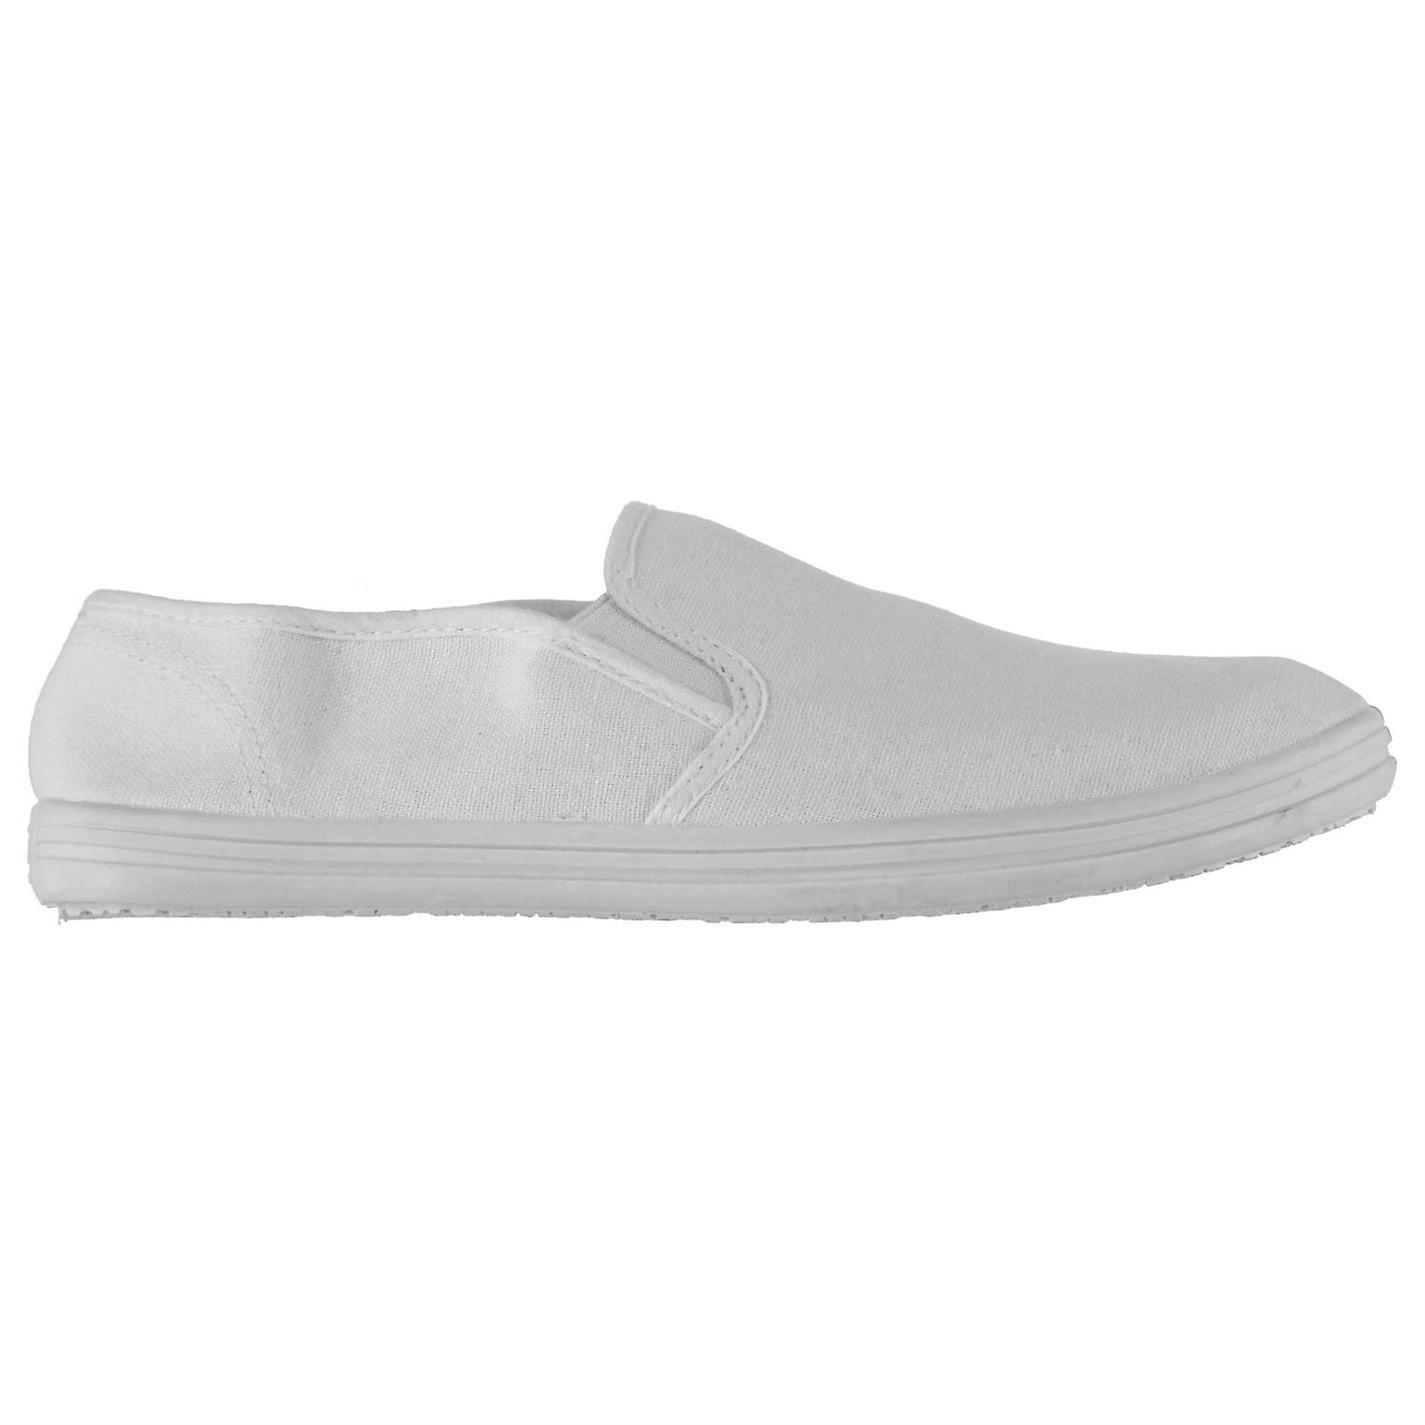 67585be3f90 Slazenger Kids Canvas Slip On Pumps Lightweight Casual Shoes Junior Boys